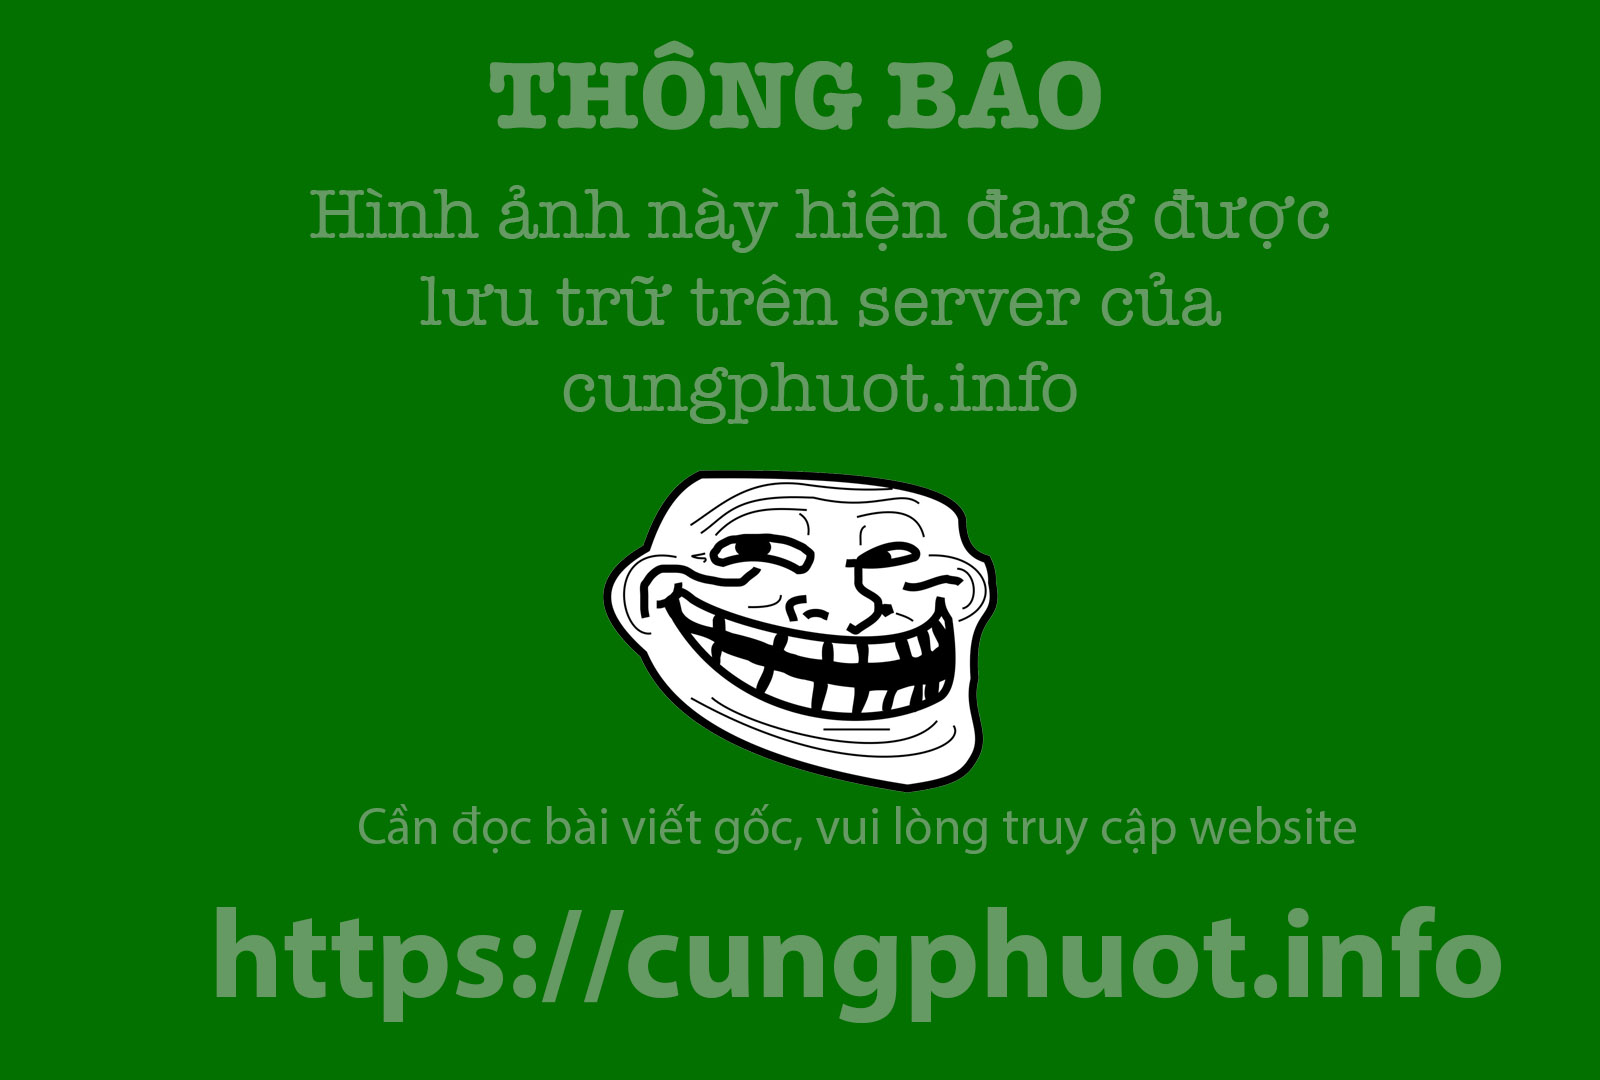 Ve dep thanh cao, huyen bi cua Dan vien Chau Son hinh anh 7